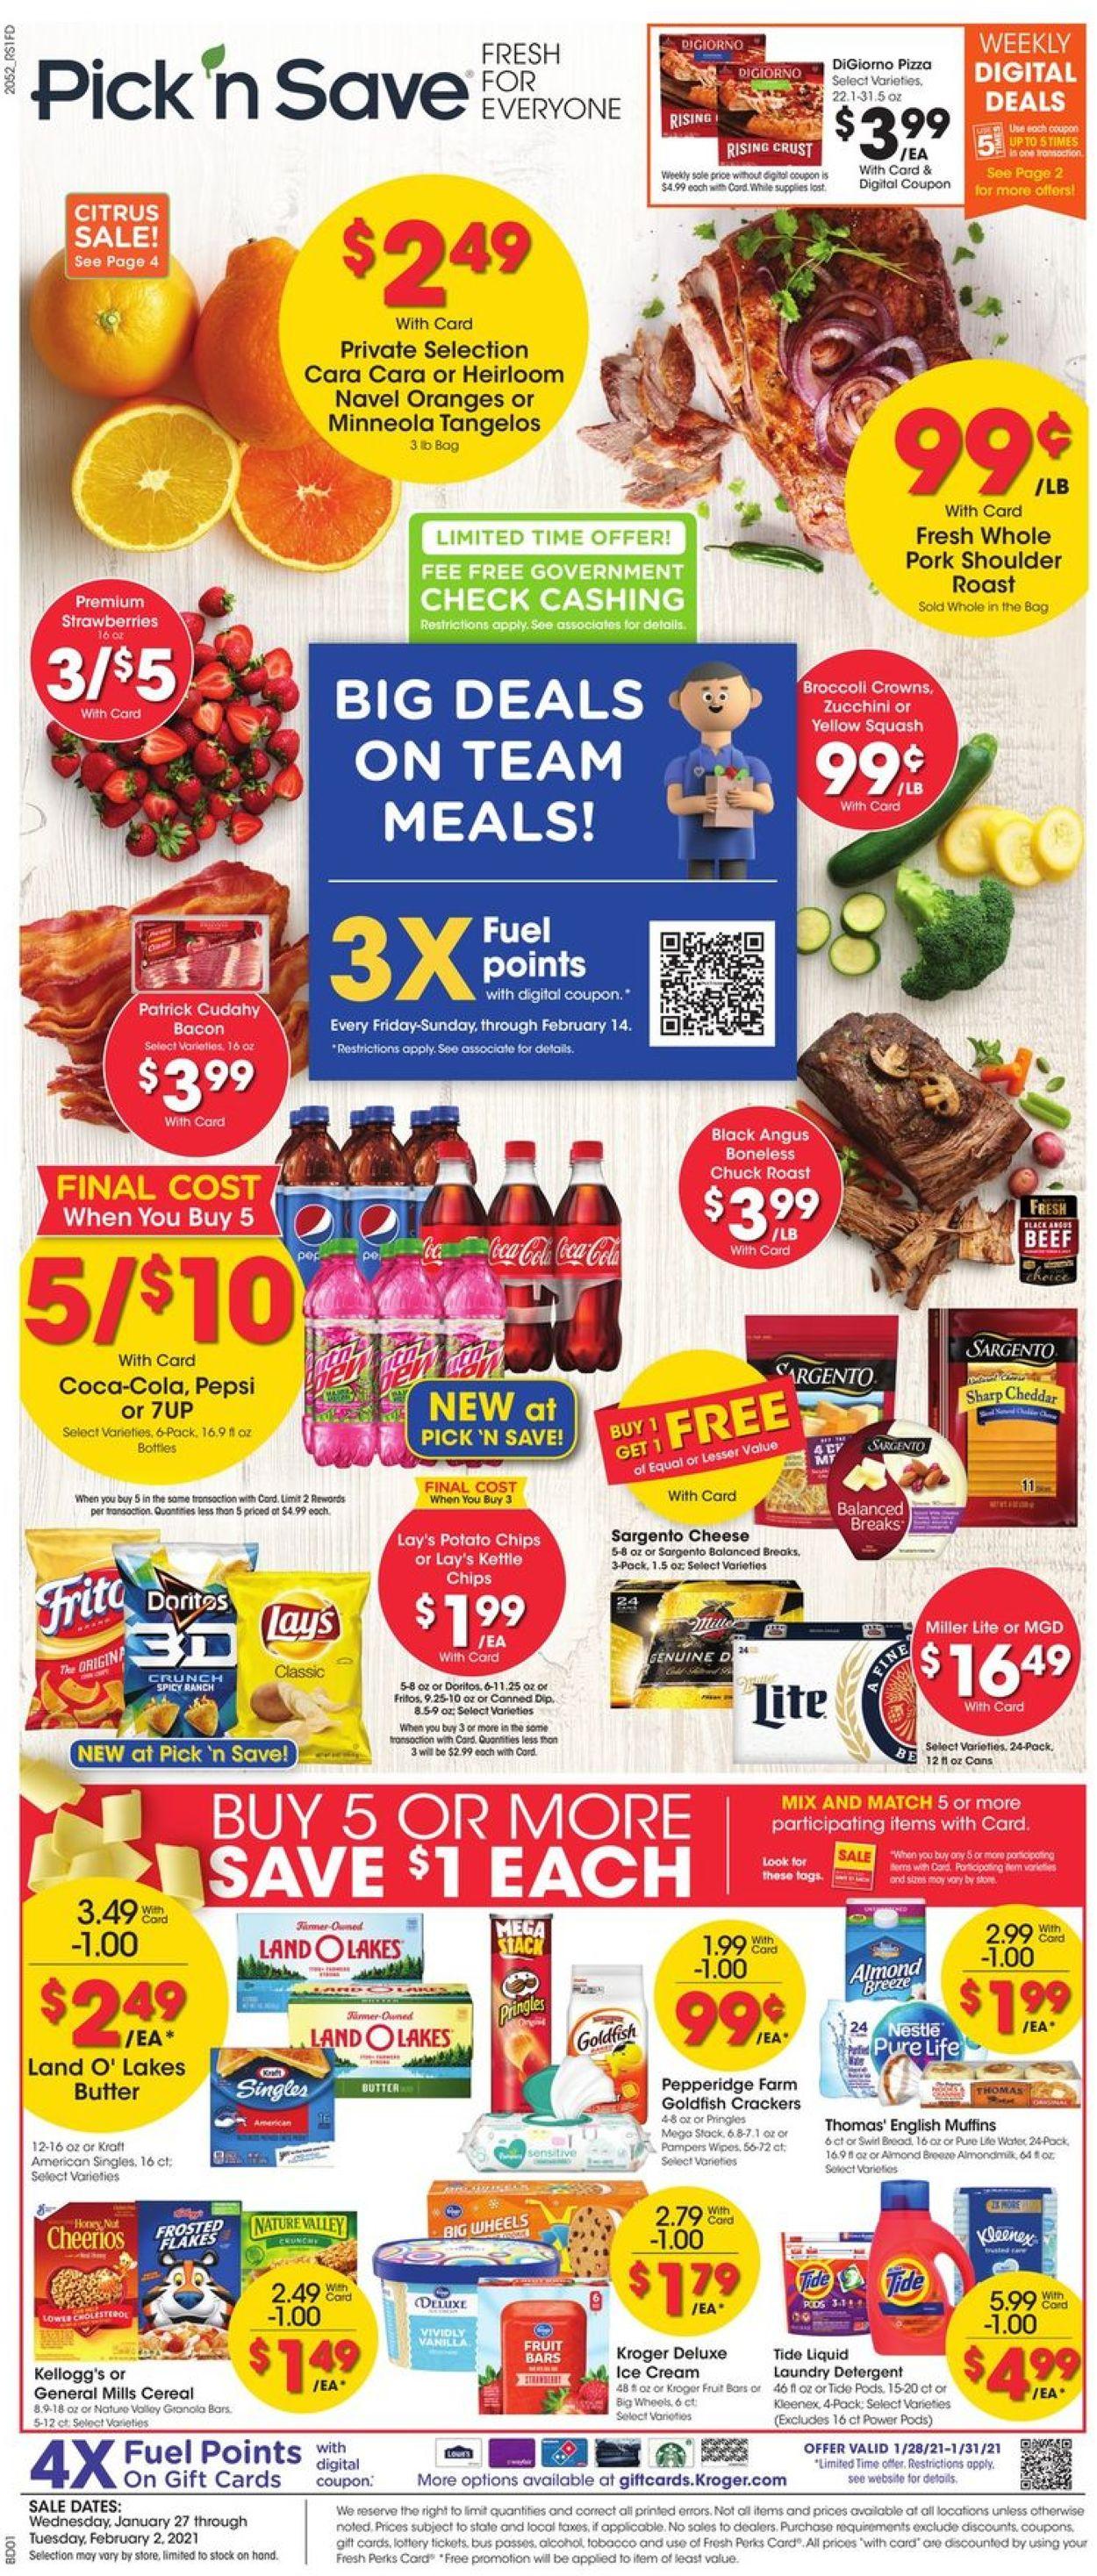 Pick 'n Save Weekly Ad Circular - valid 01/27-02/02/2021